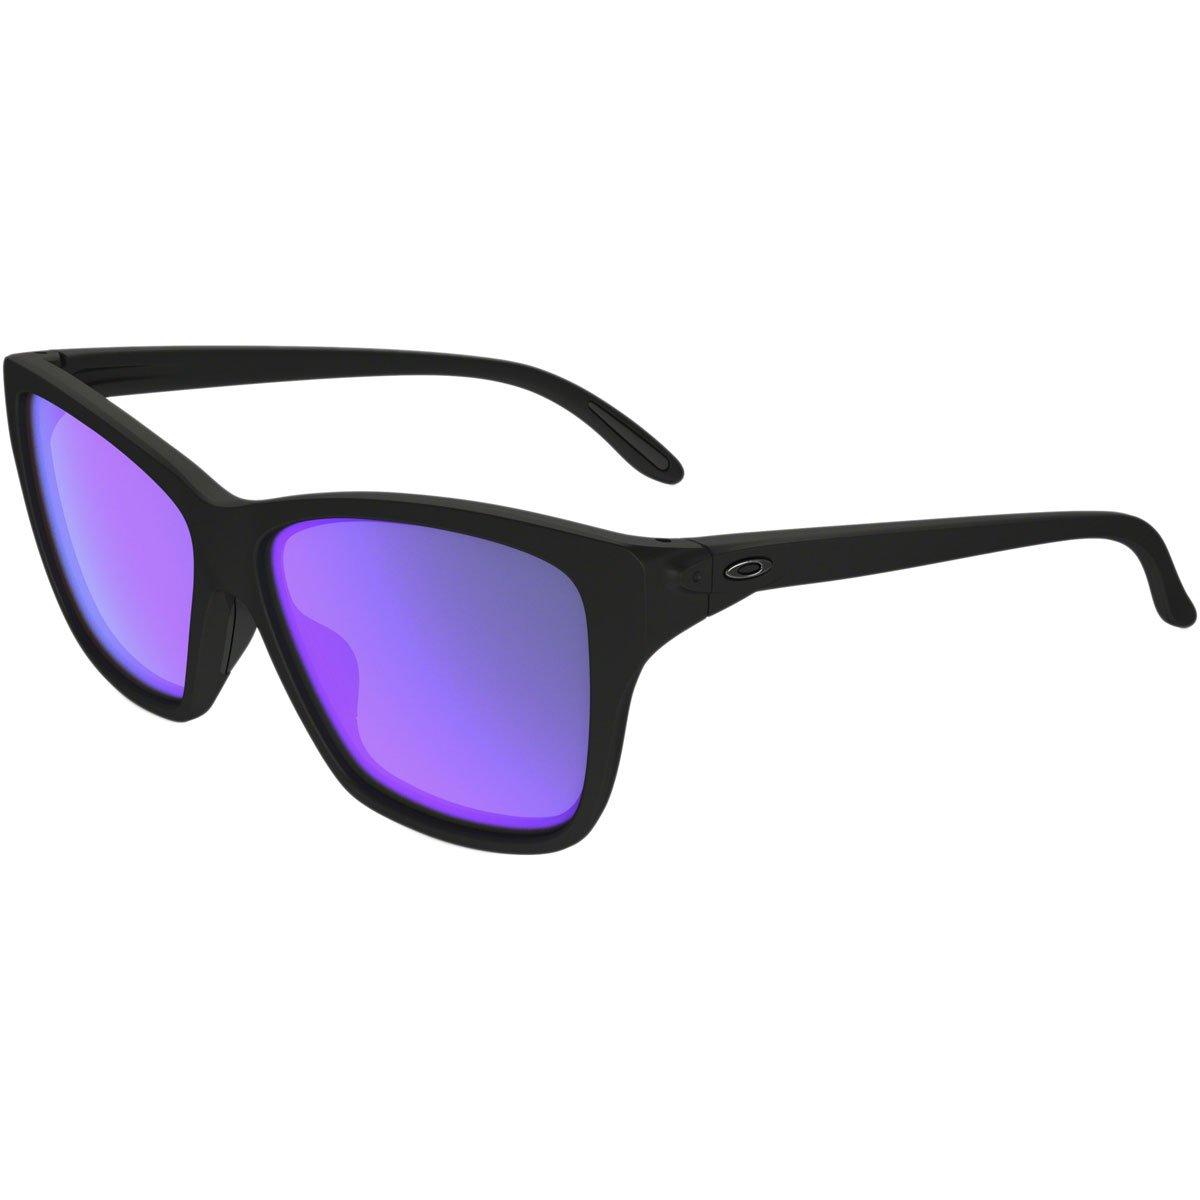 Oakley Women's OO9298 Hold On Irregular Sunglasses, Matte Black/Violet Iridium, 58 mm by Oakley